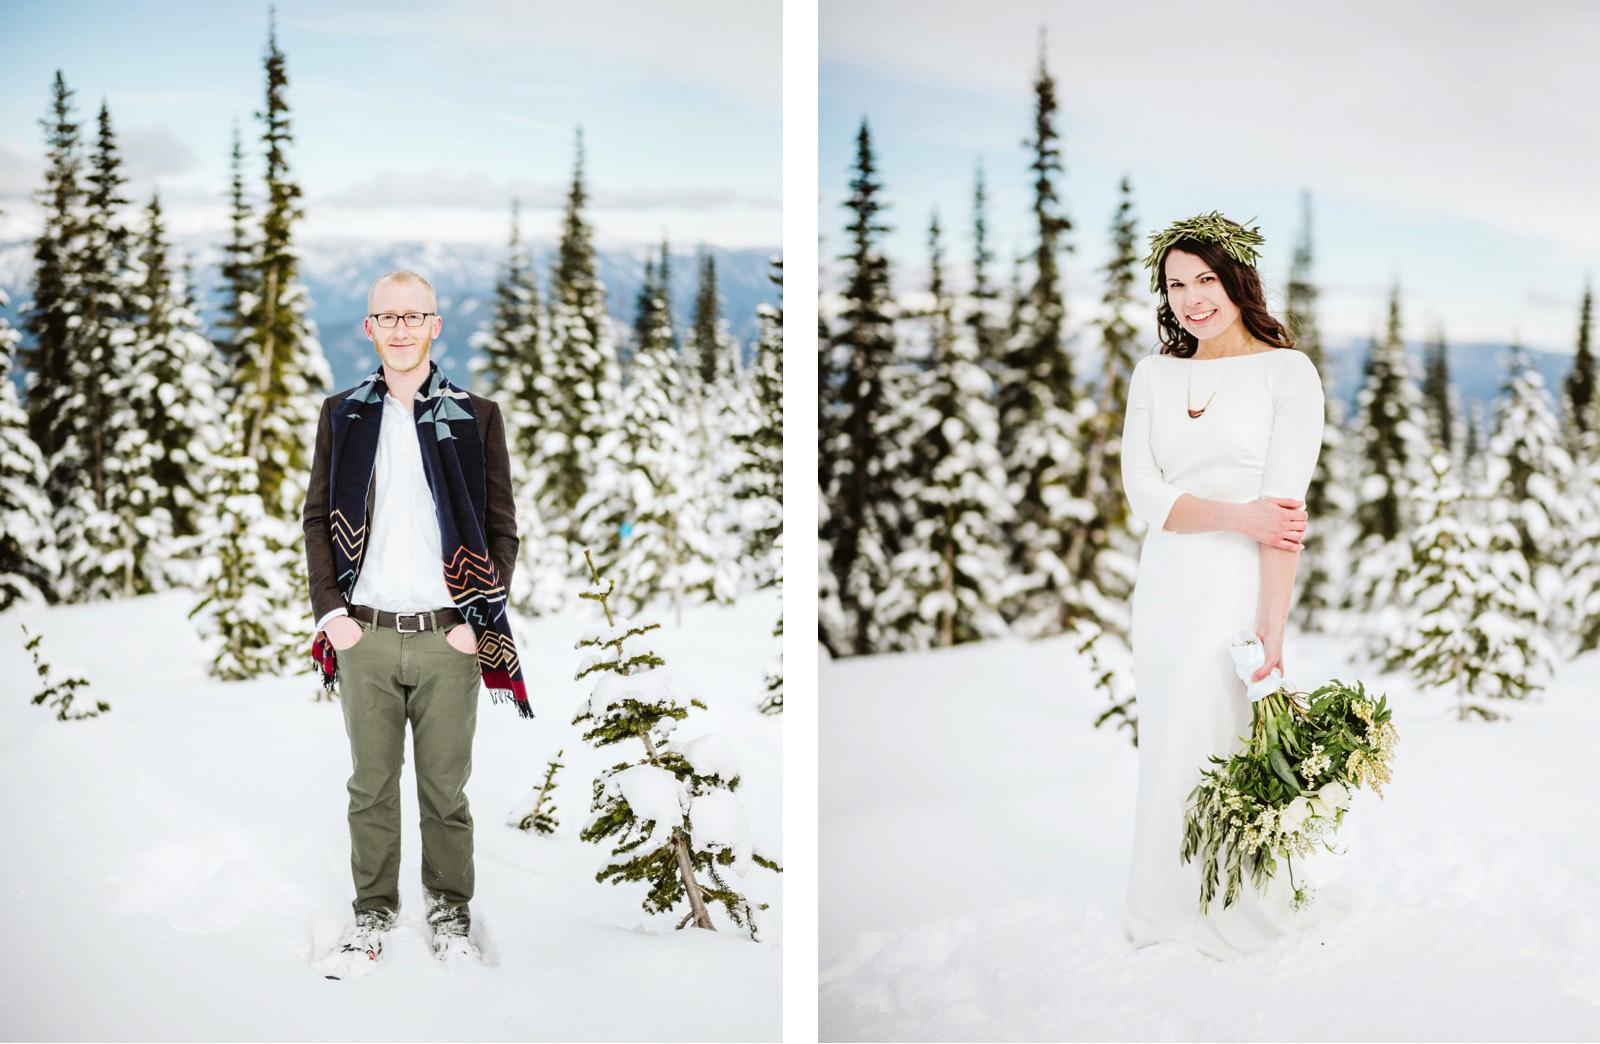 alpine-lakes-high-camp-winter-wedding-58 ALPINE LAKES HIGH CAMP WEDDING